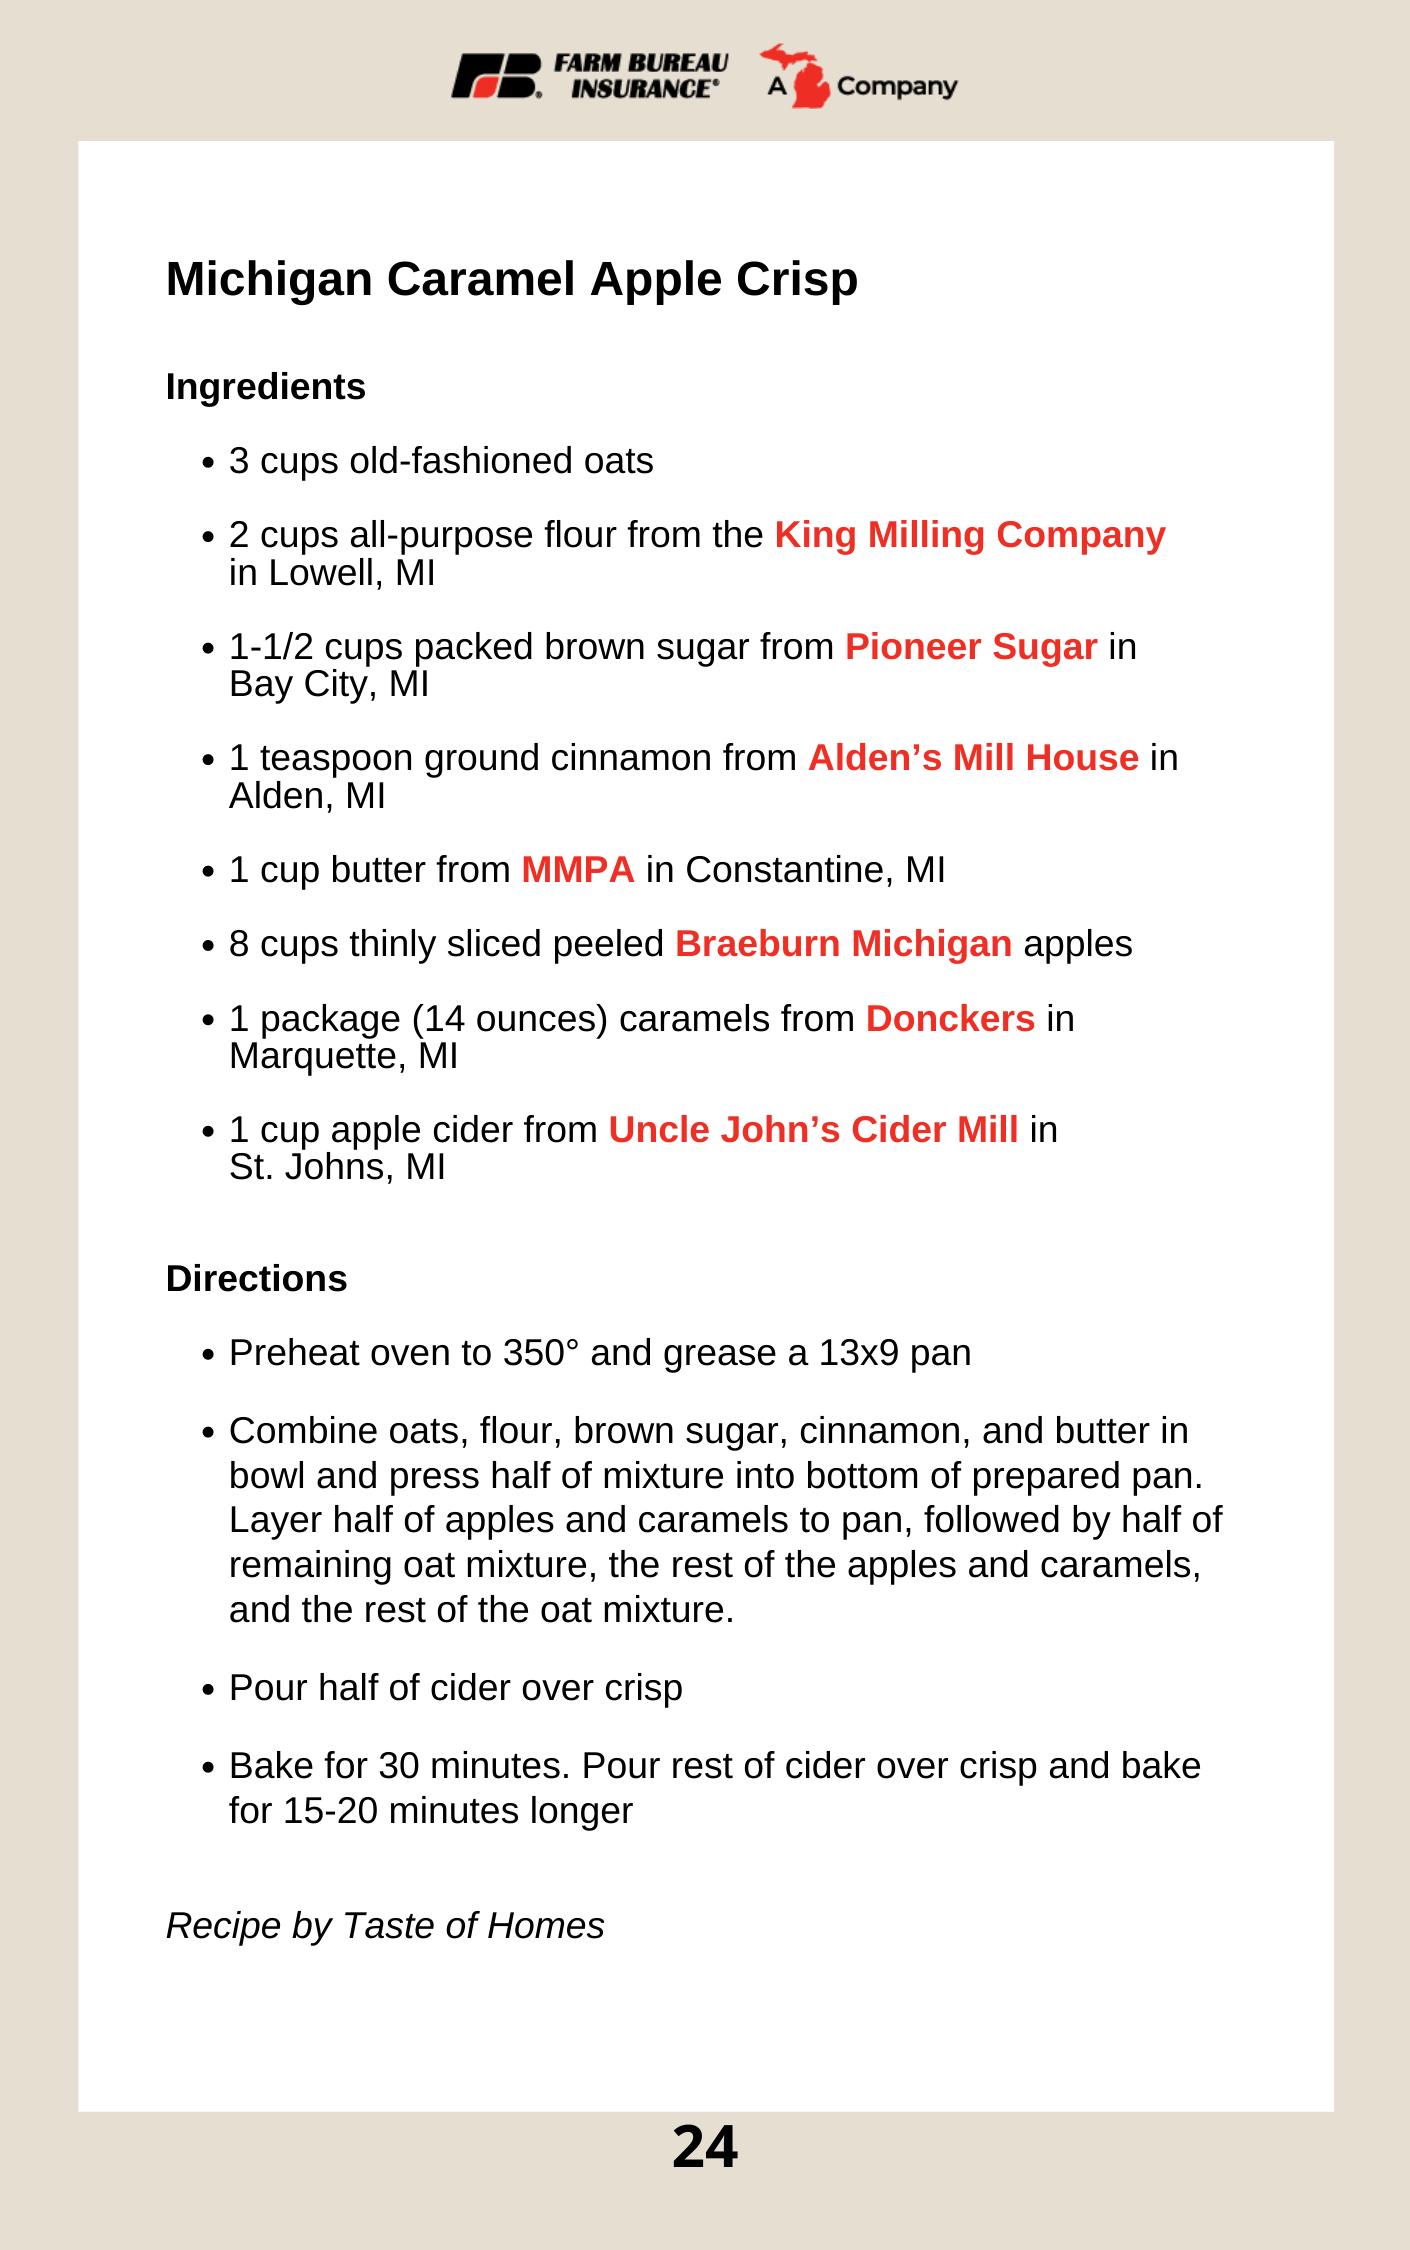 Michigan Caramel Apple Crisp in 2020 Caramel apple crisp